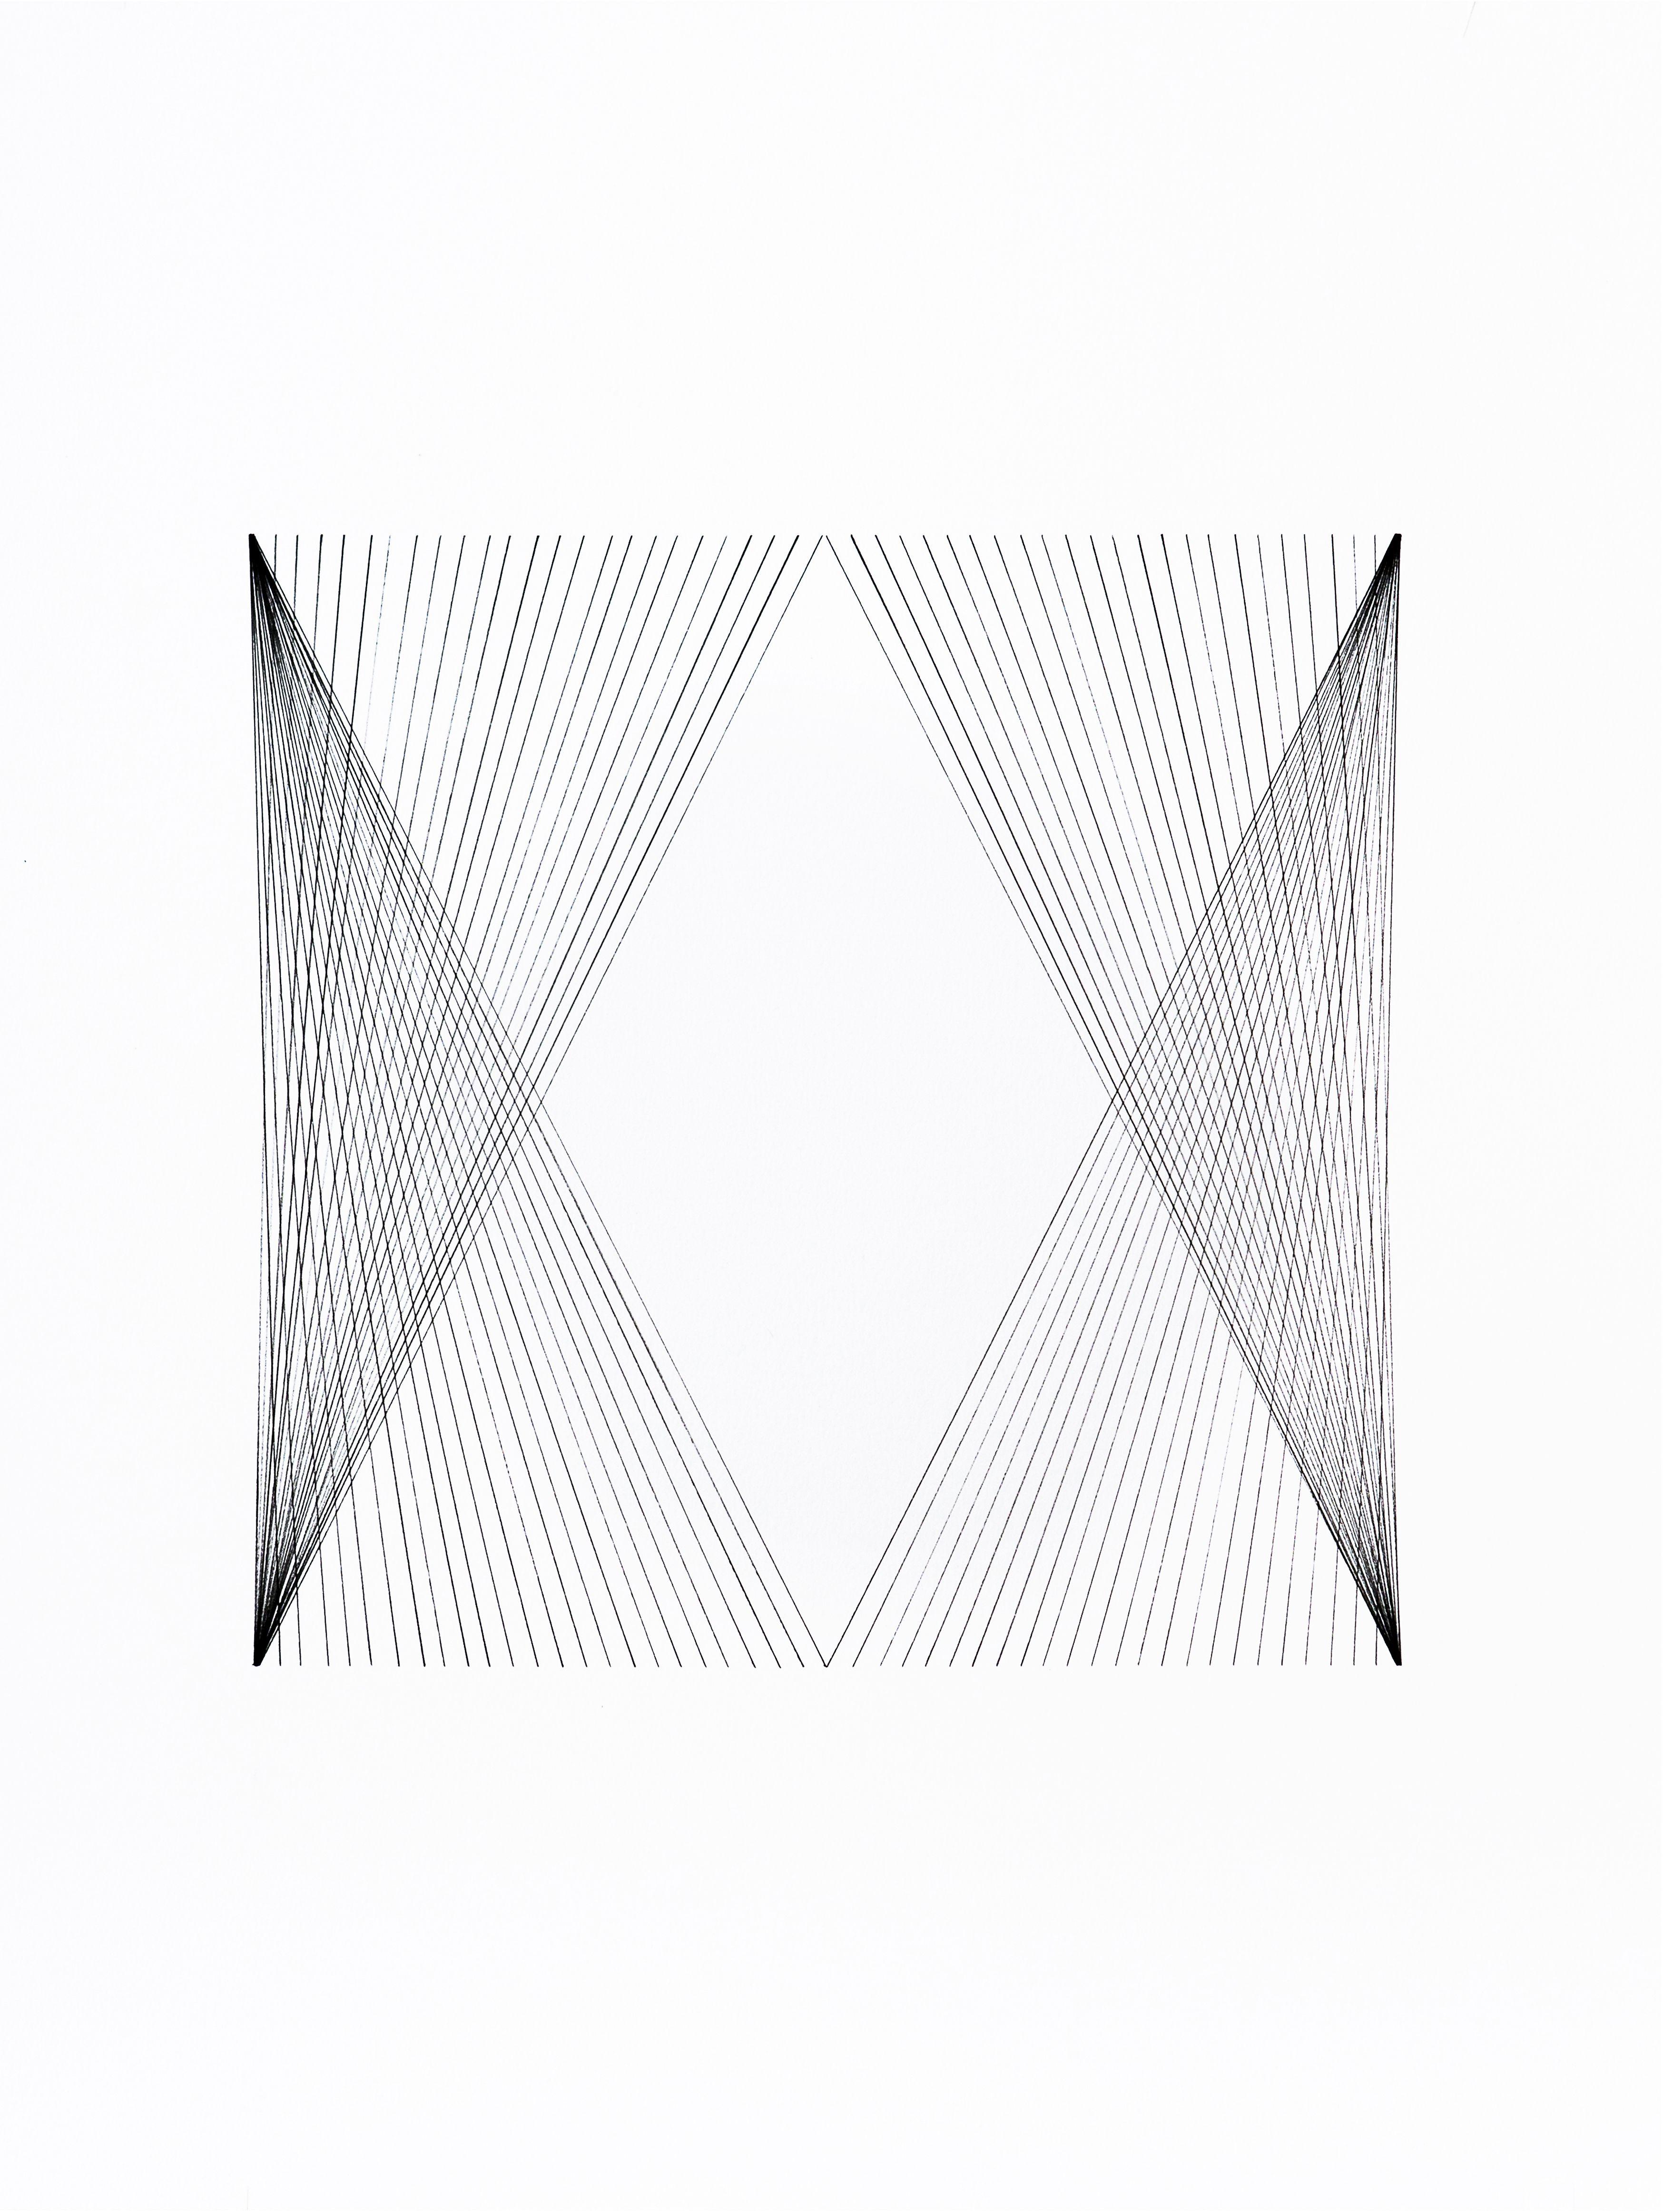 Title: 12x12 Series Untitled #04 Artist: Ryan Roa #inkonpaper #contemporaryart #Ryan Roa #gallerynine5 #StressPoints